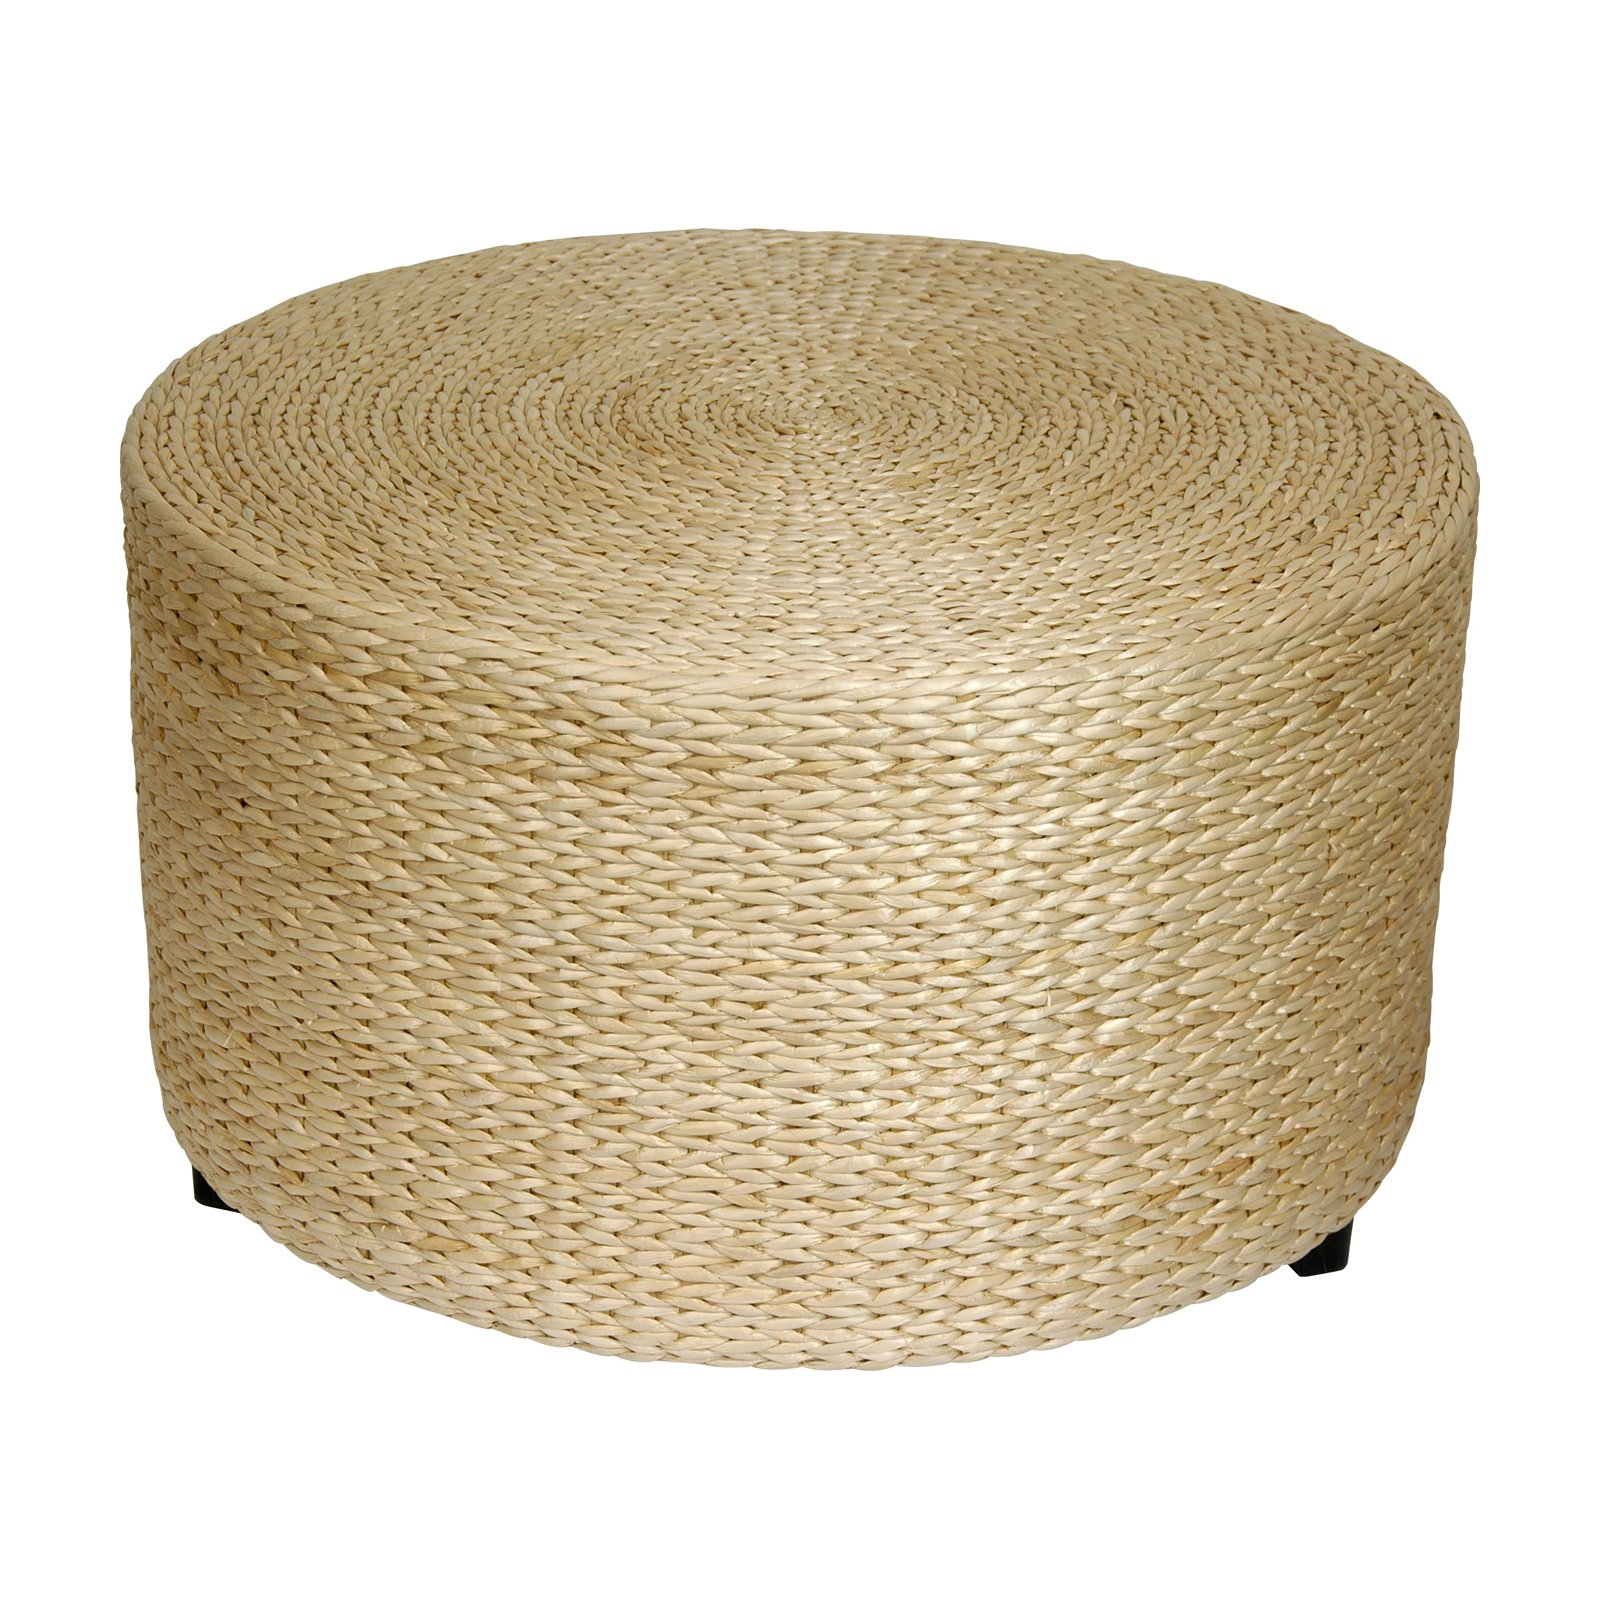 - Oriental Furniture Rush Grass Coffee Table/Ottoman - Walmart.com